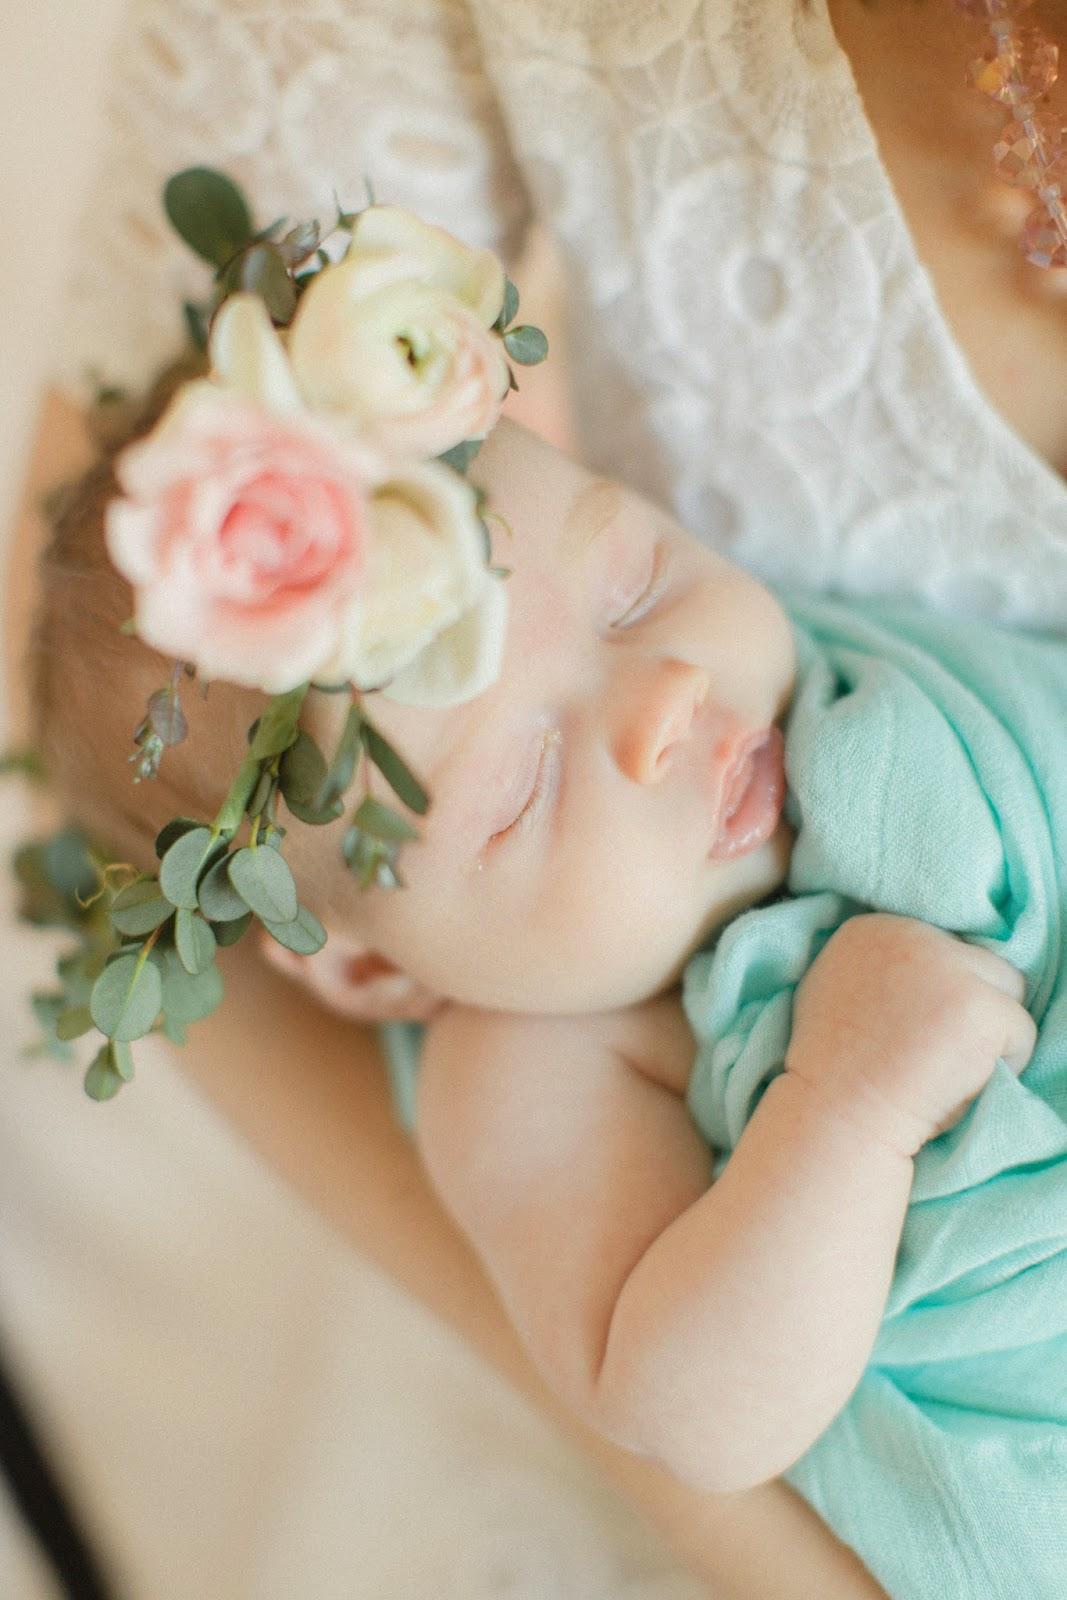 Newborn photoshoot floral crown wreath deborah zoe photography newborn photoshoot floral crown wreath deborah zoe photography izmirmasajfo